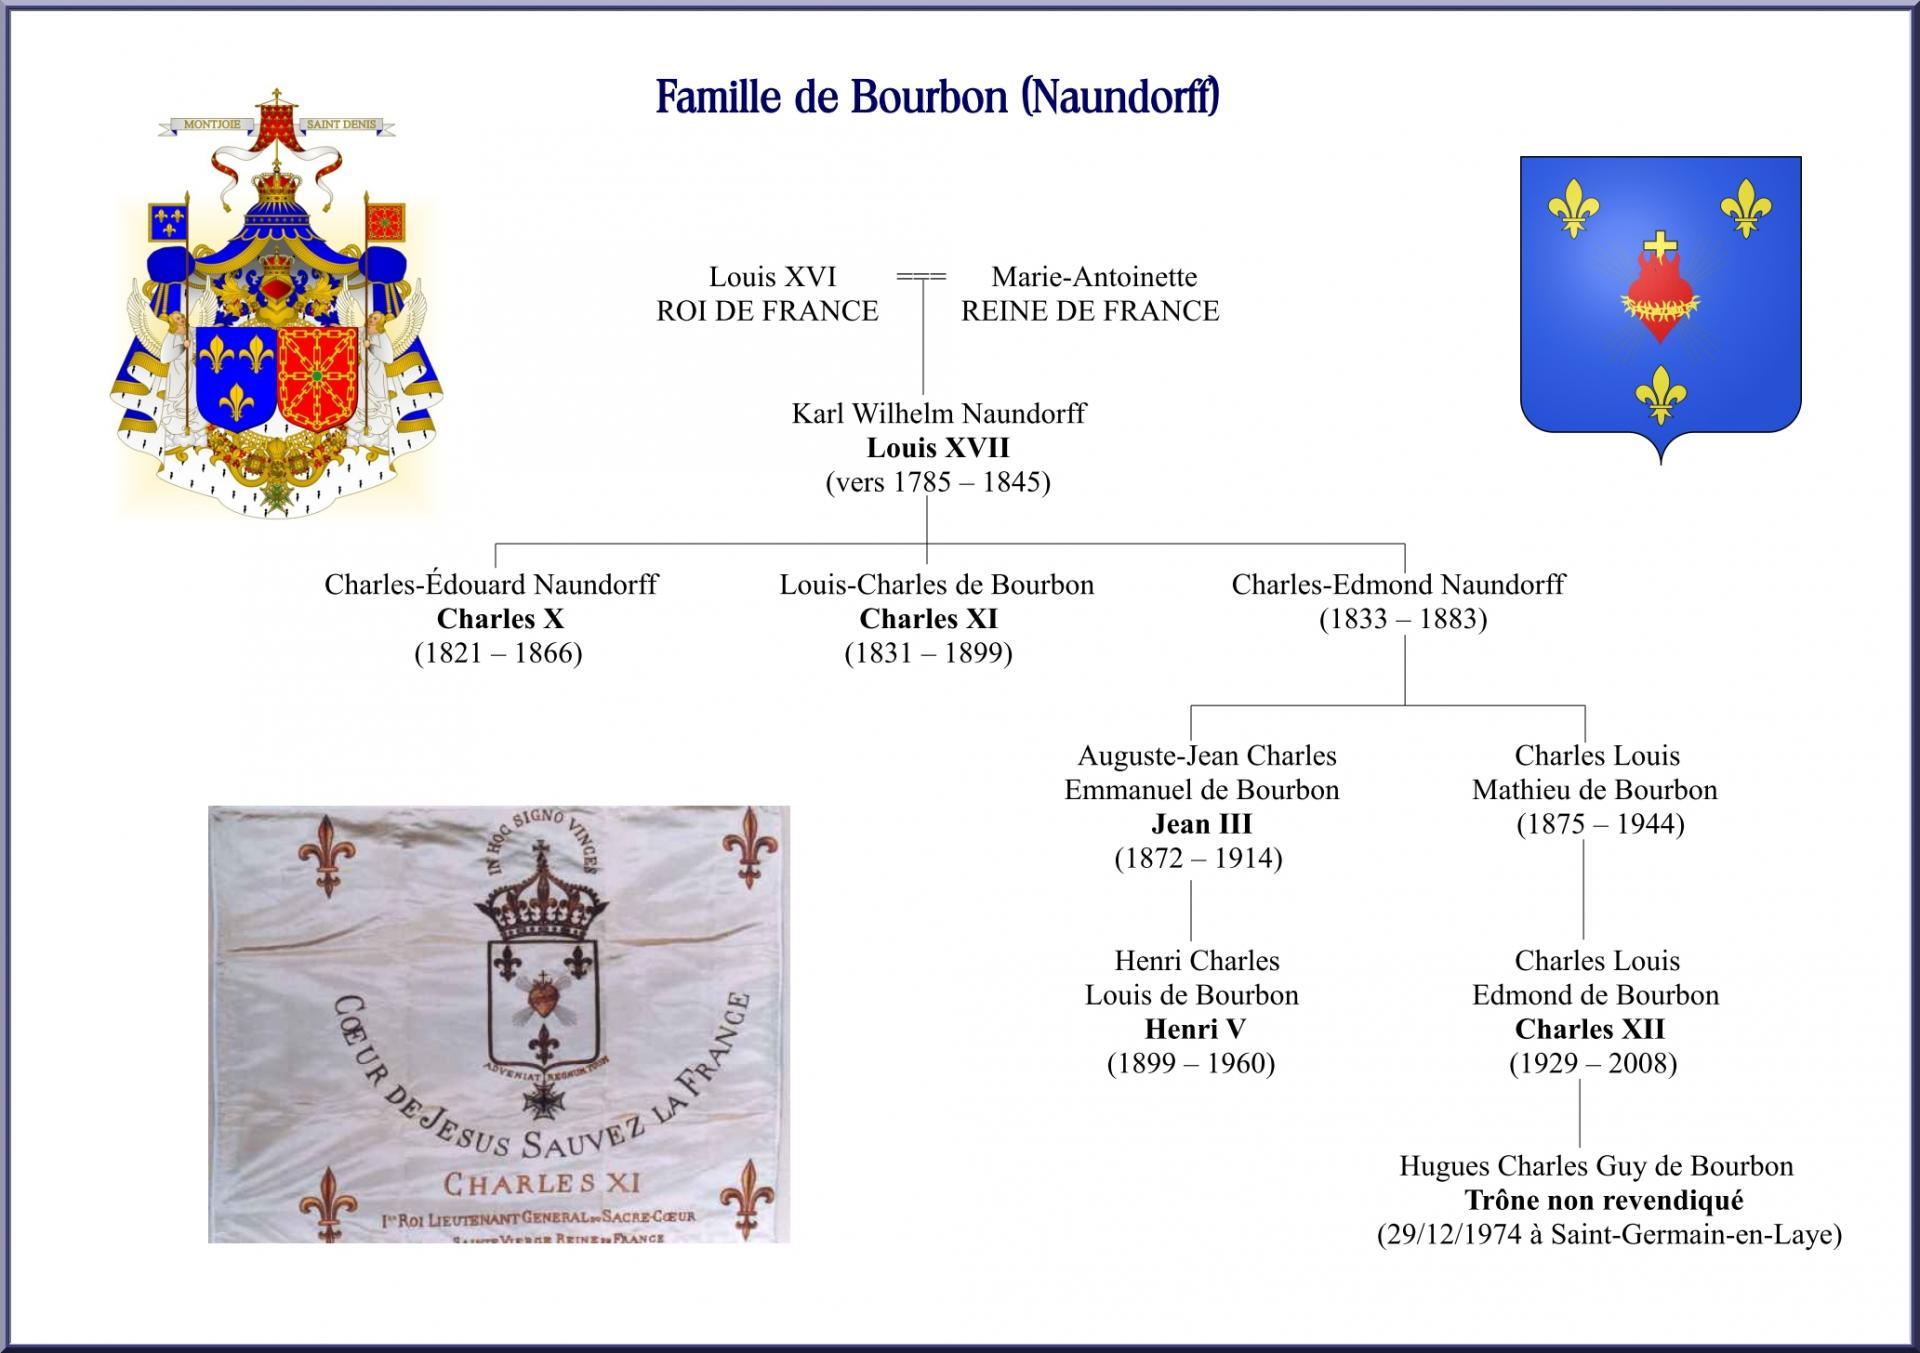 Famille de bourbon naundorff